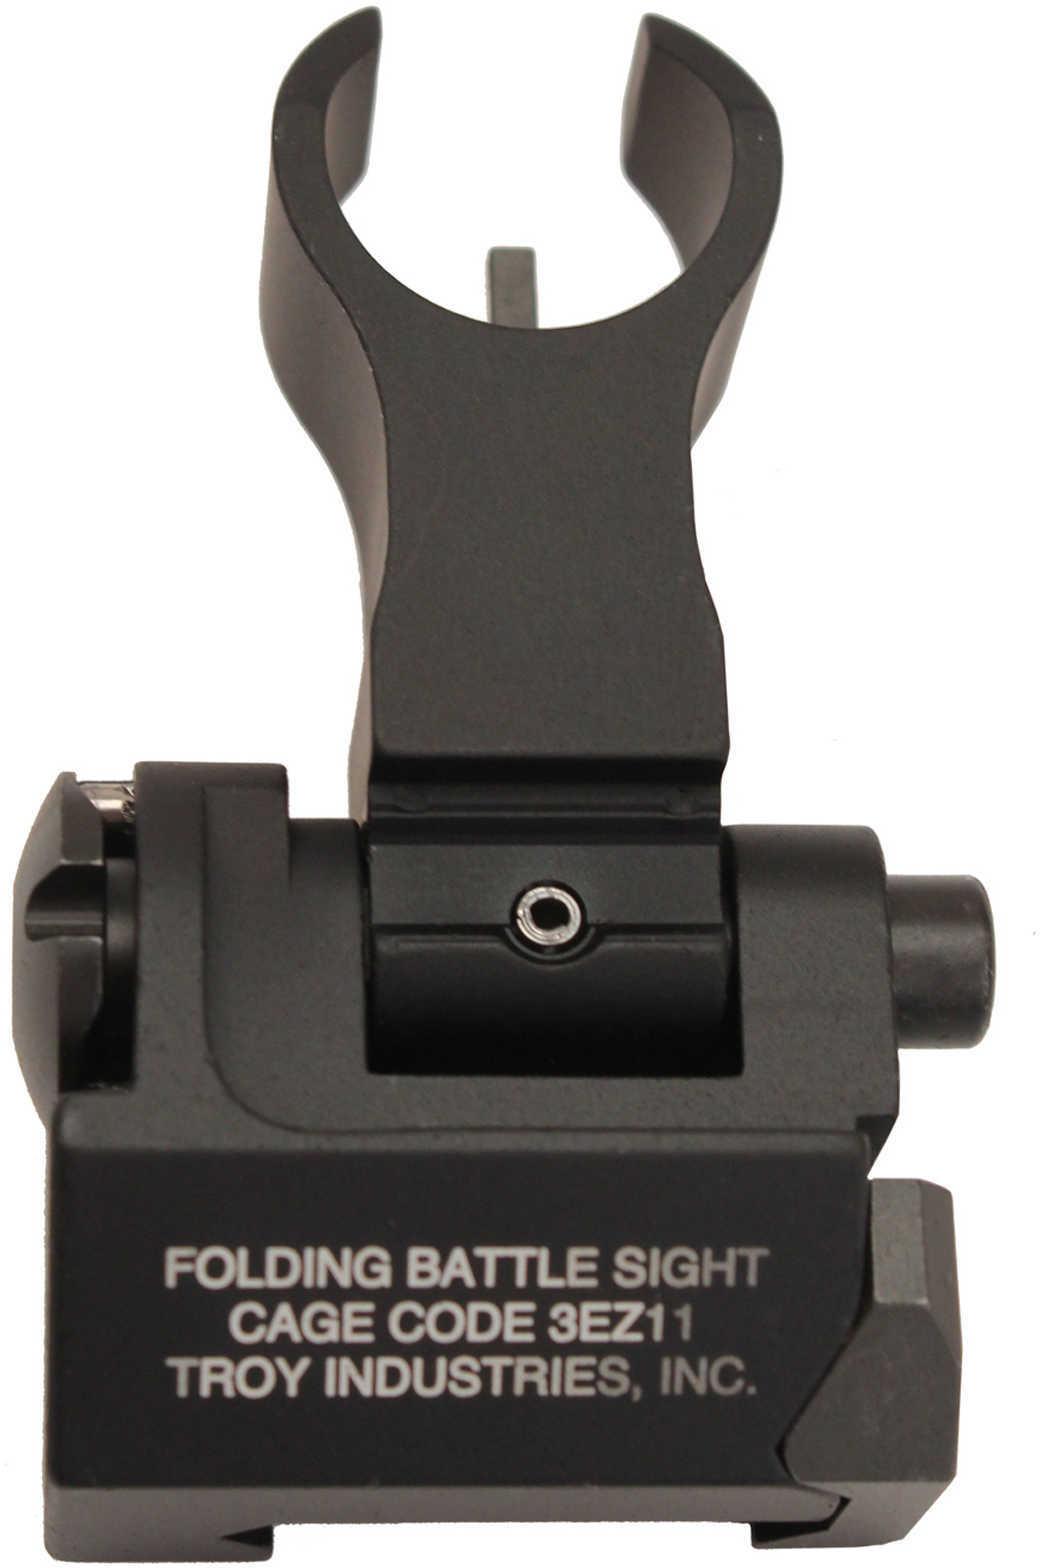 AR-15 Front HK Style Sight Folding, Black Md: SSIG-FBS-FHBT-00